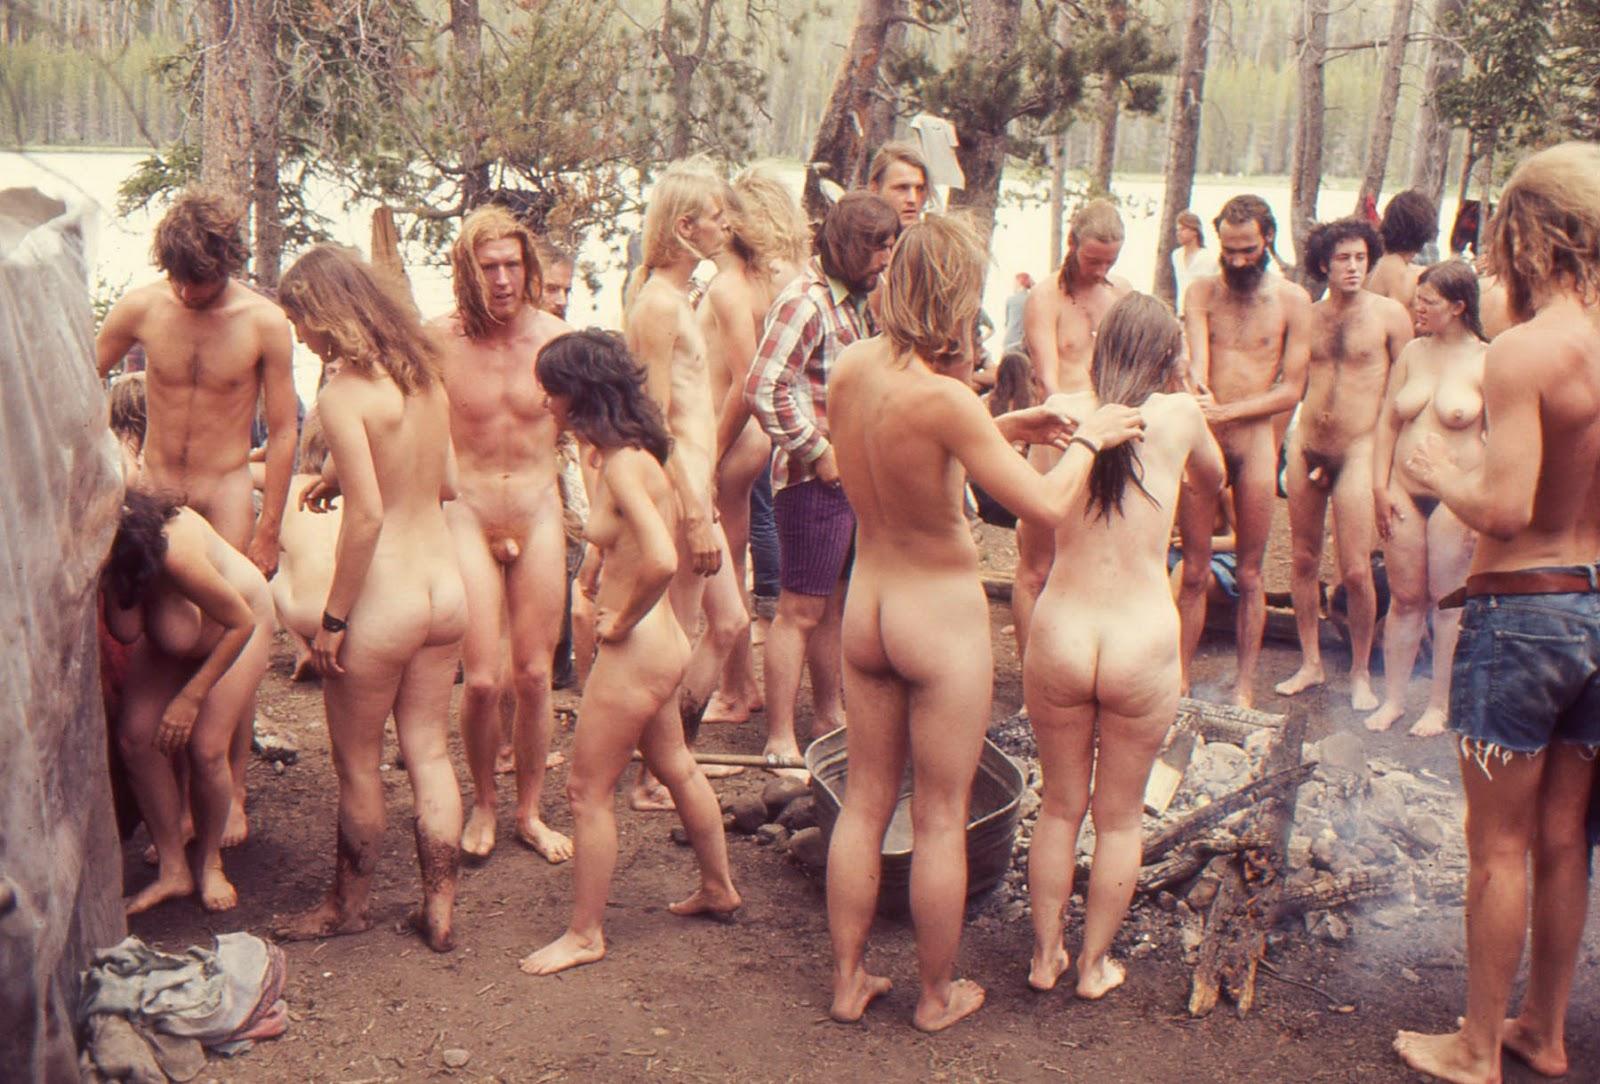 Look Amateur nudist group commit